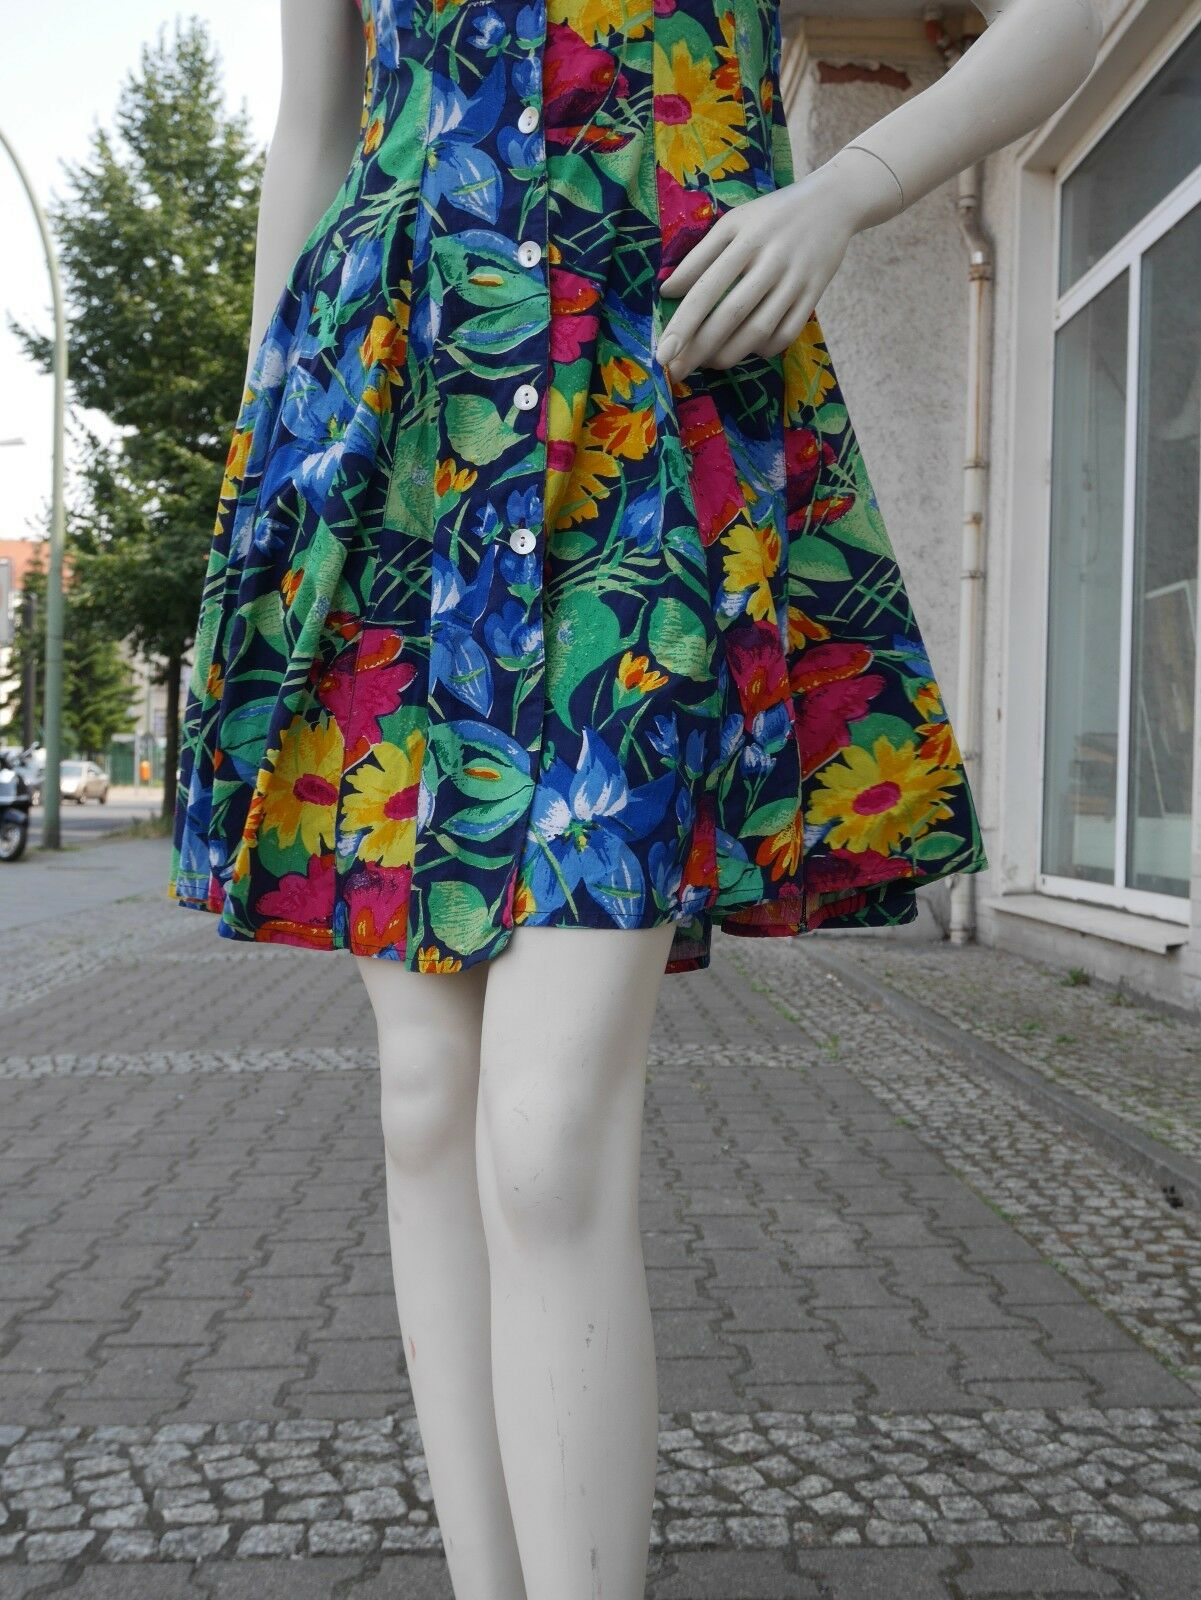 MISS JOY Kleid 36 floral Sommerkleid 90er TRUE TRUE TRUE VINTAGE floral sun dress 90s 23dd79